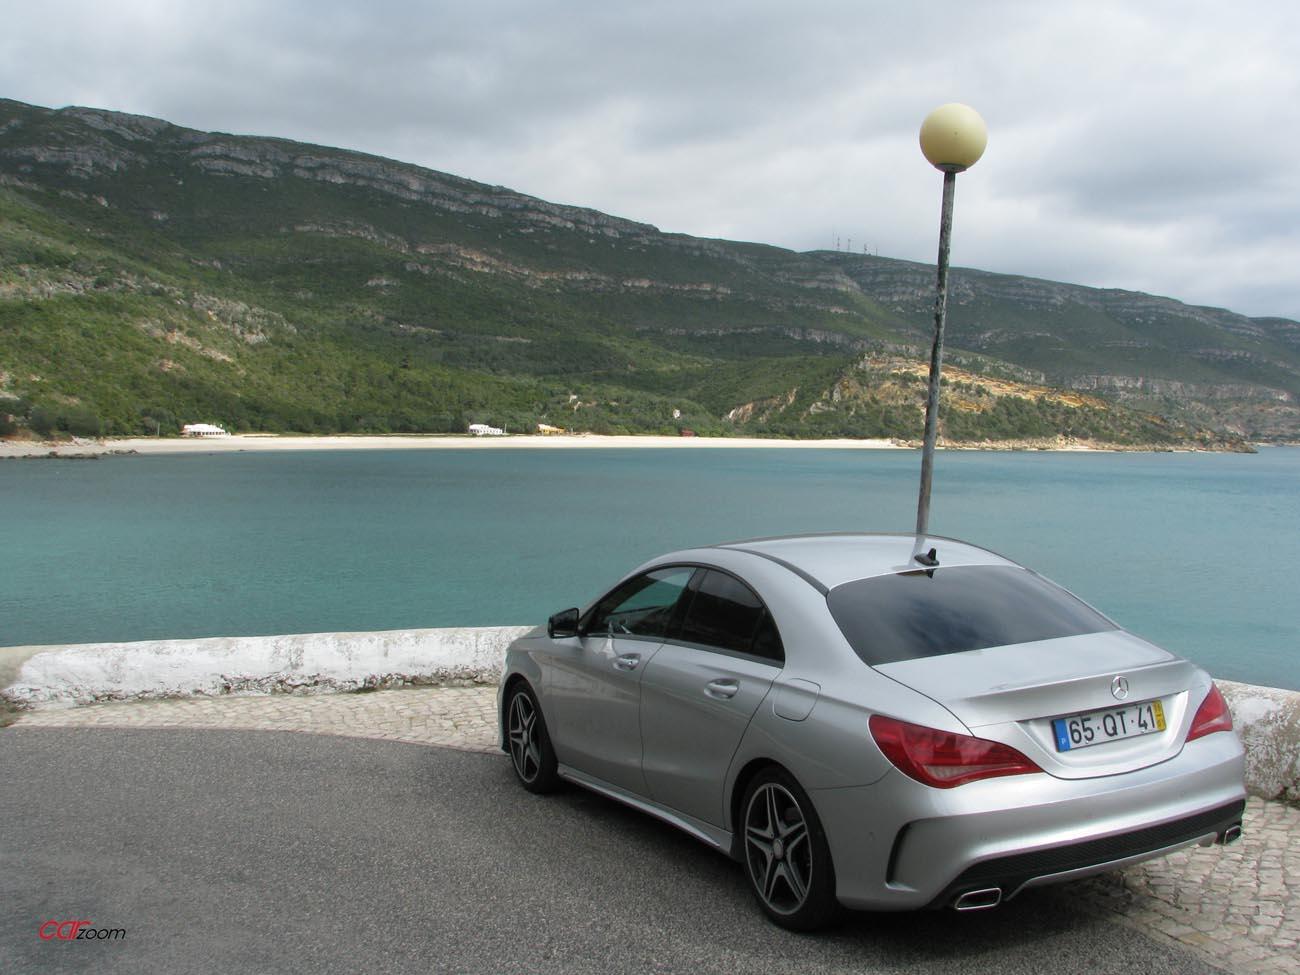 Mercedes cla 180d amg line requinte desportivo carzoom for Mercedes benz pt